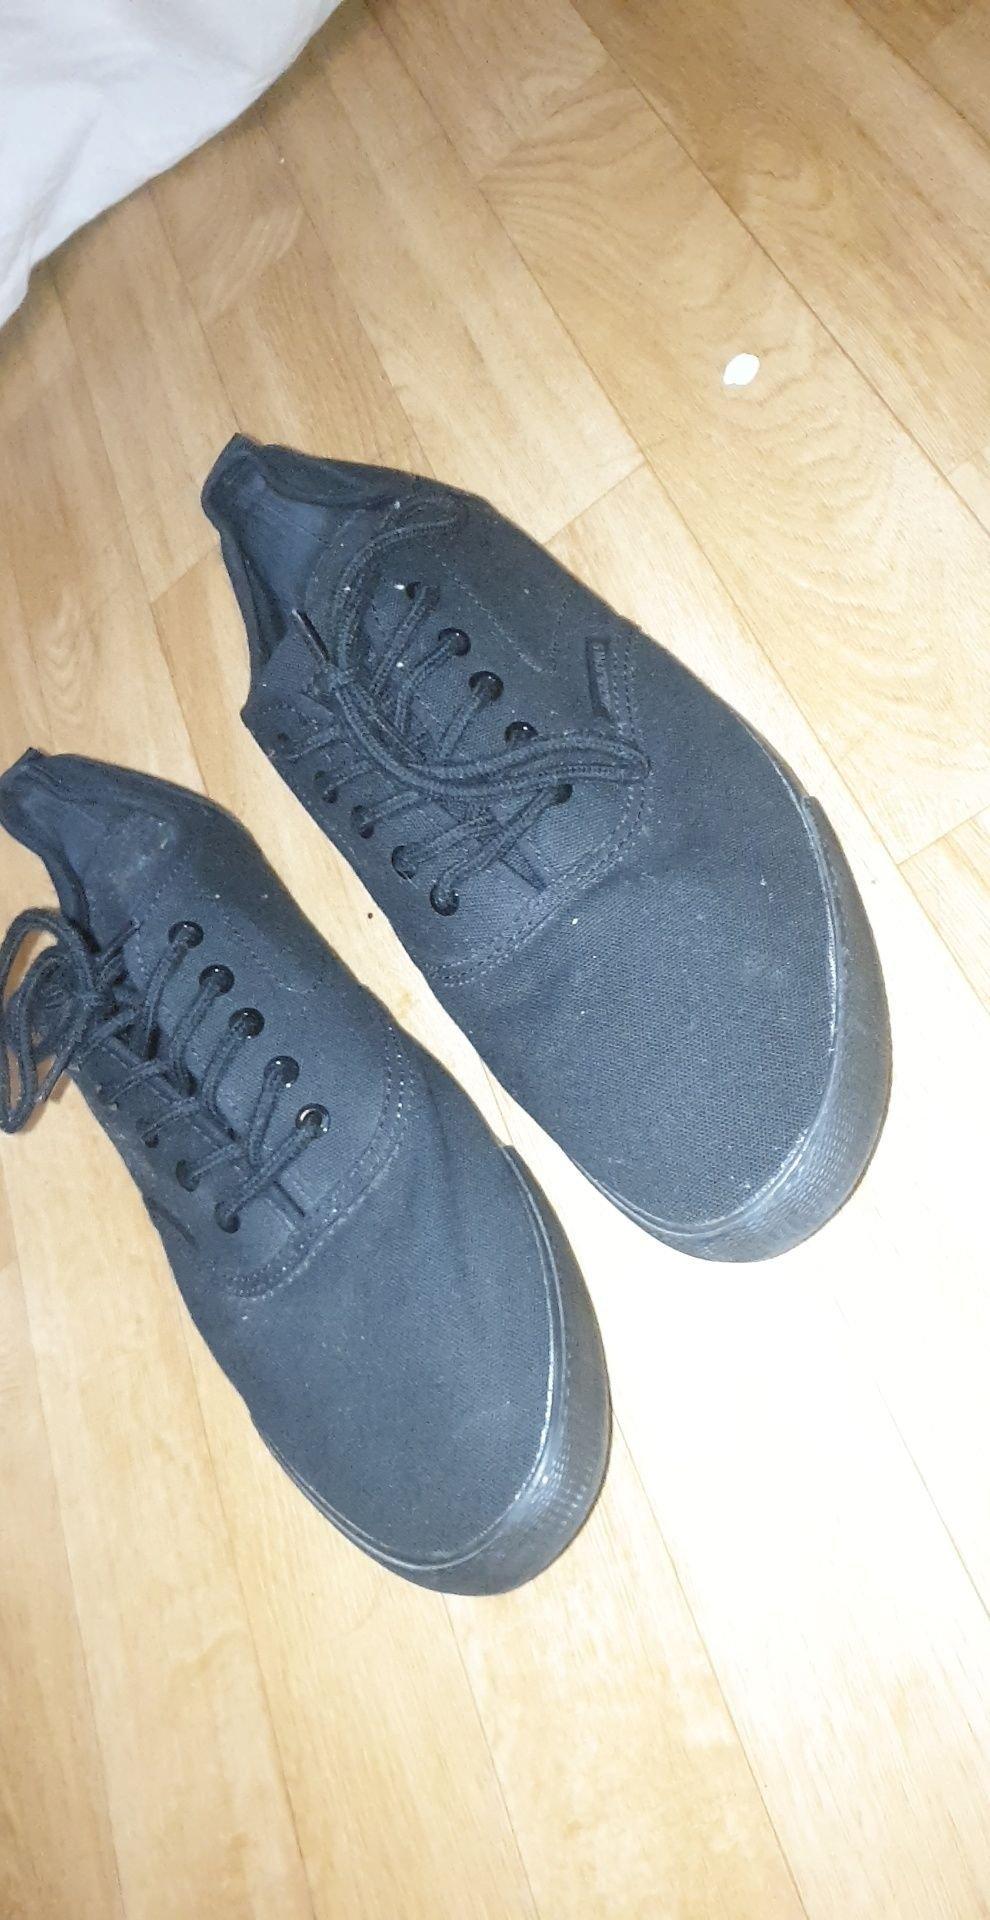 Fabriks Outlet Sells nyaste kollektion Sprillans nya jack and jones skor 43 (373163660) ᐈ Köp på Tradera